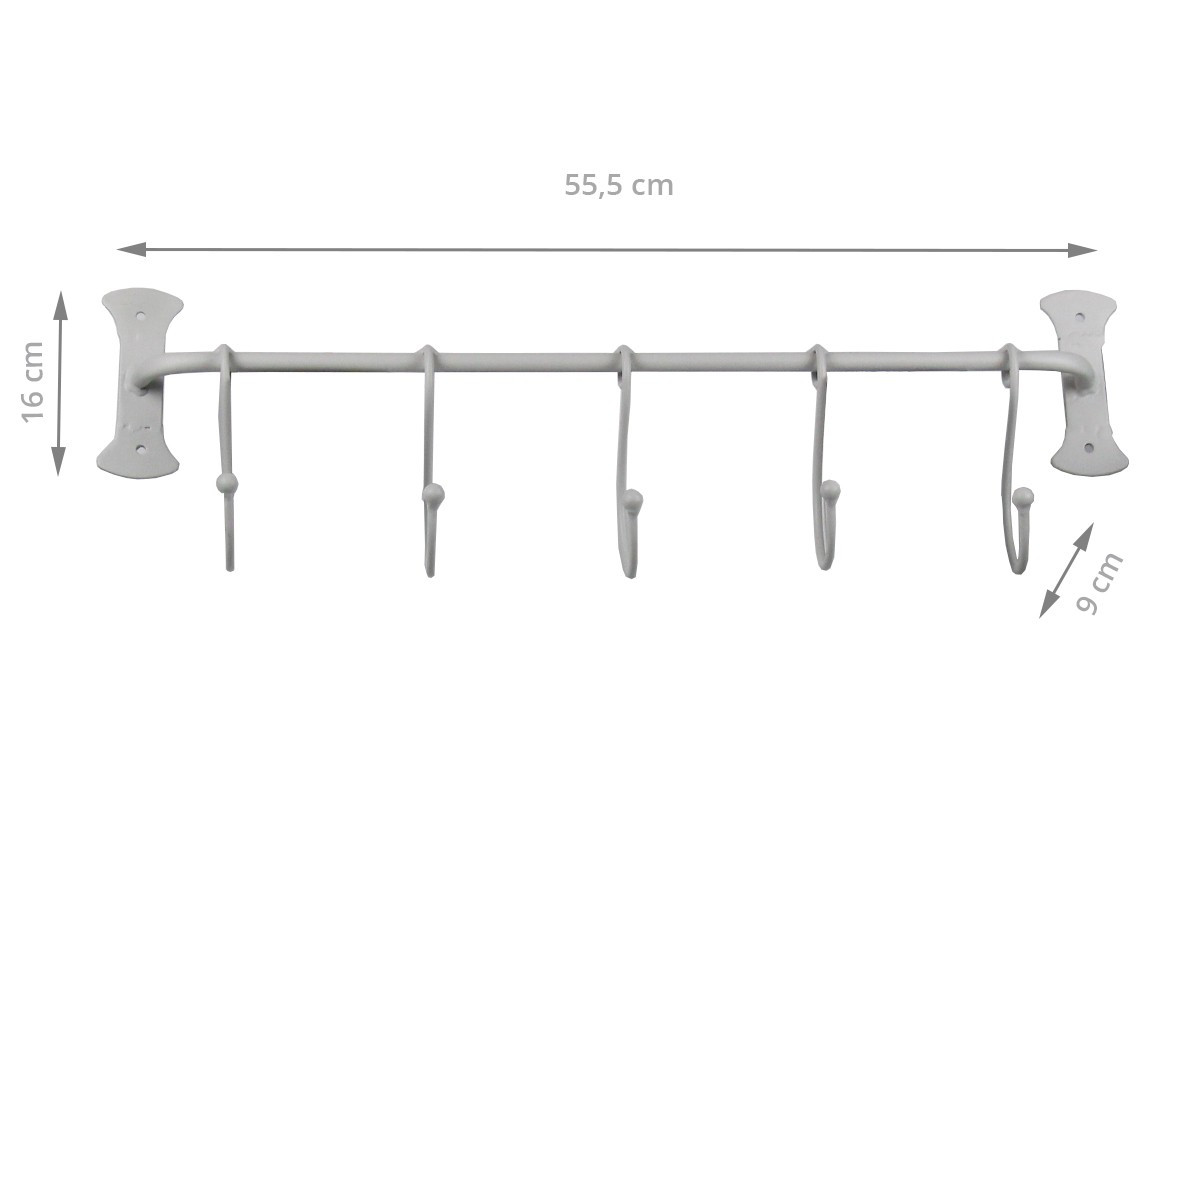 barre ustensiles en m tal peint rangement vaisselle. Black Bedroom Furniture Sets. Home Design Ideas